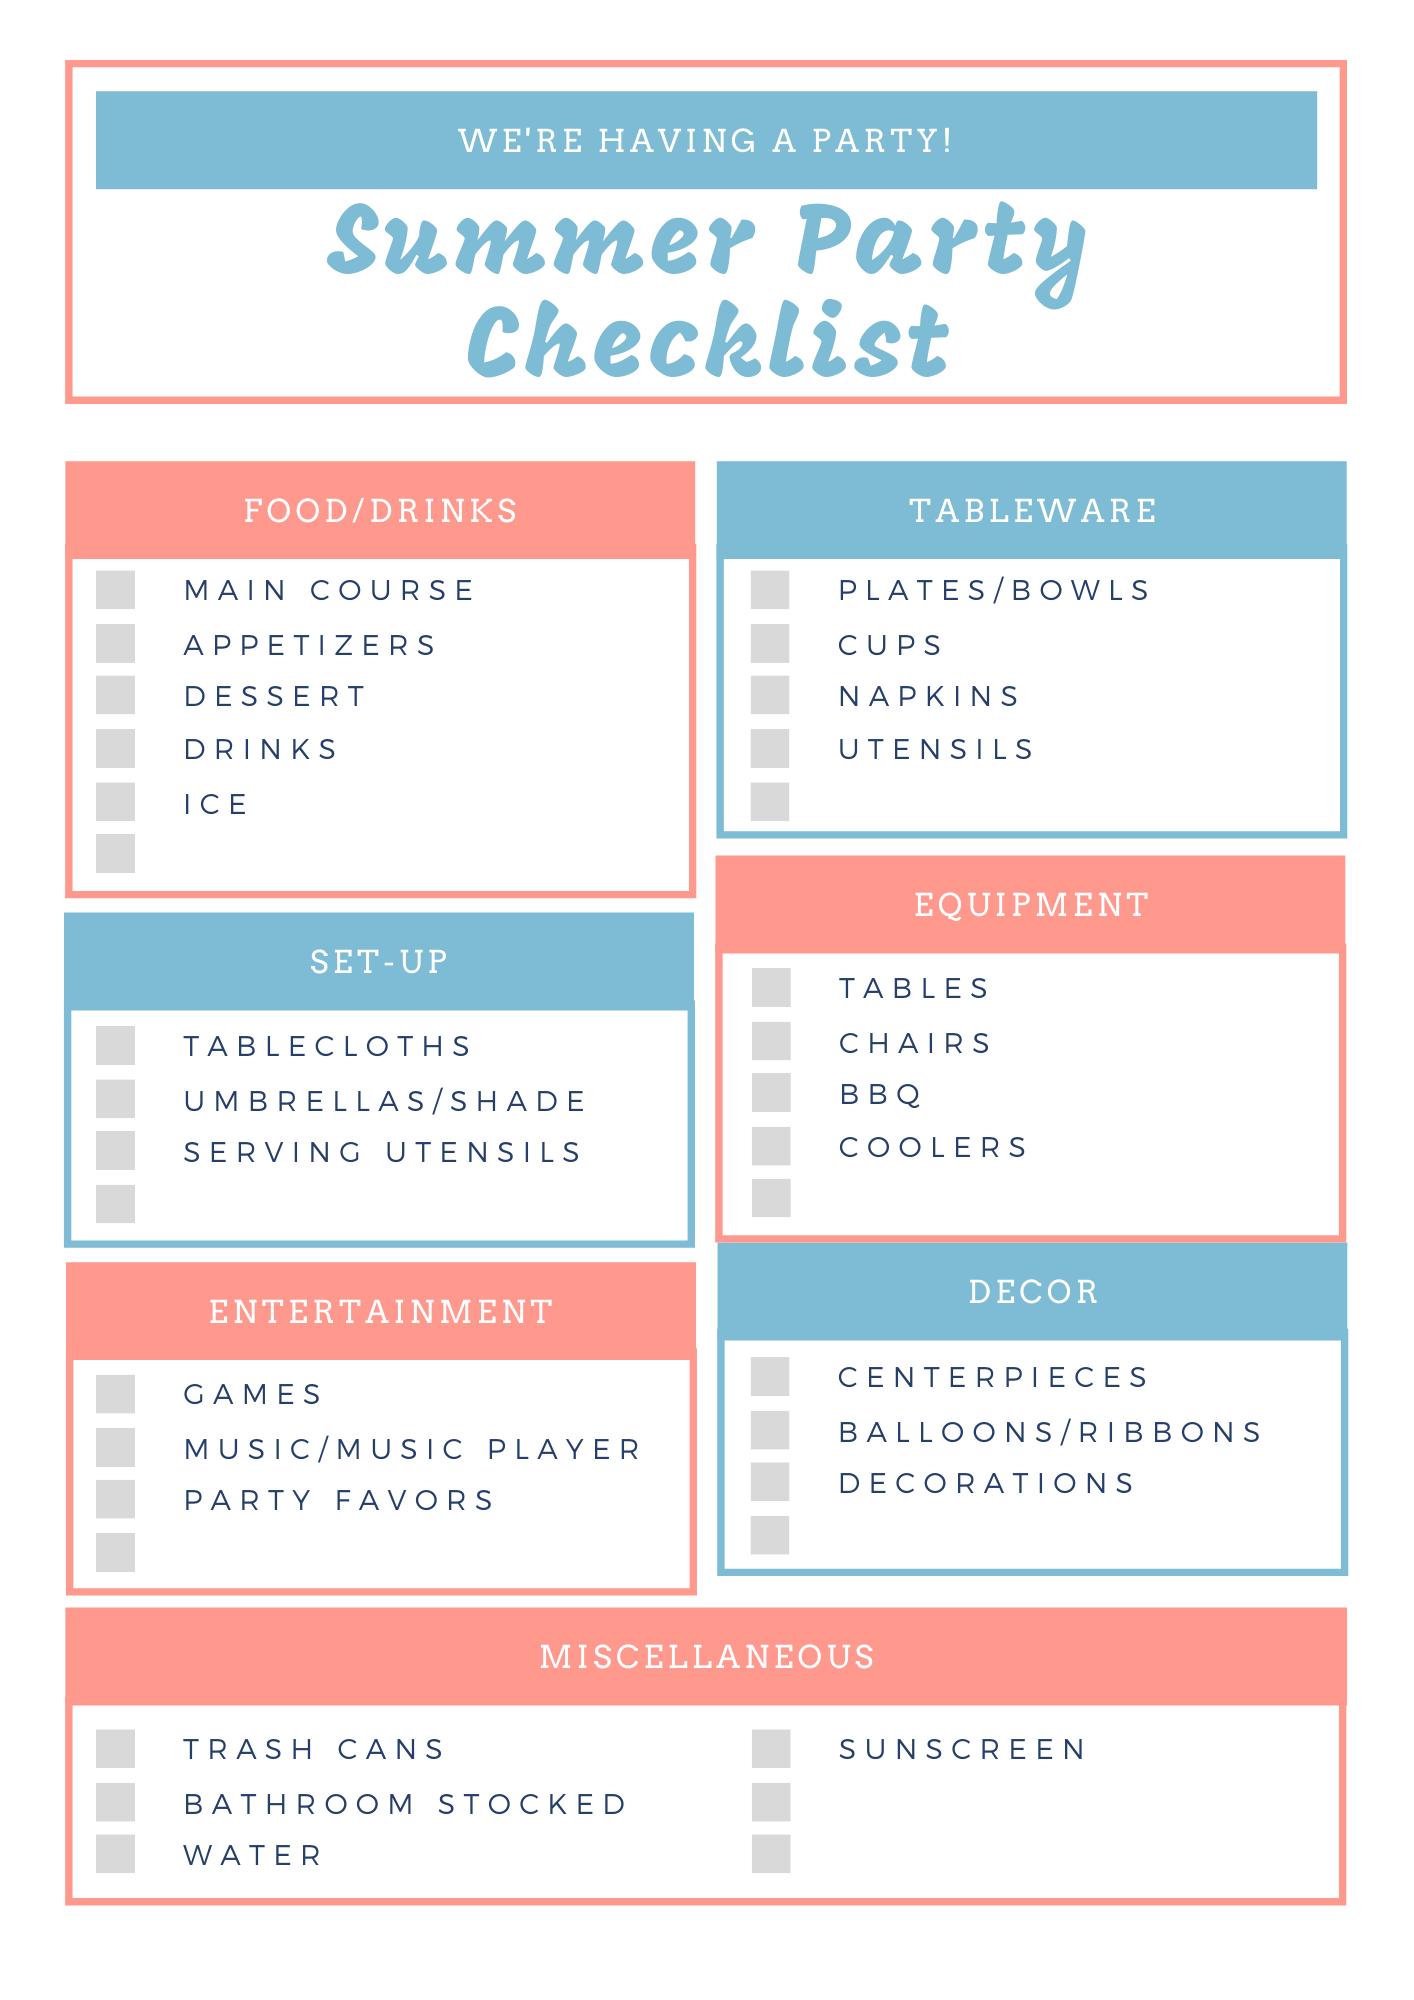 Summer Party Checklist Printable